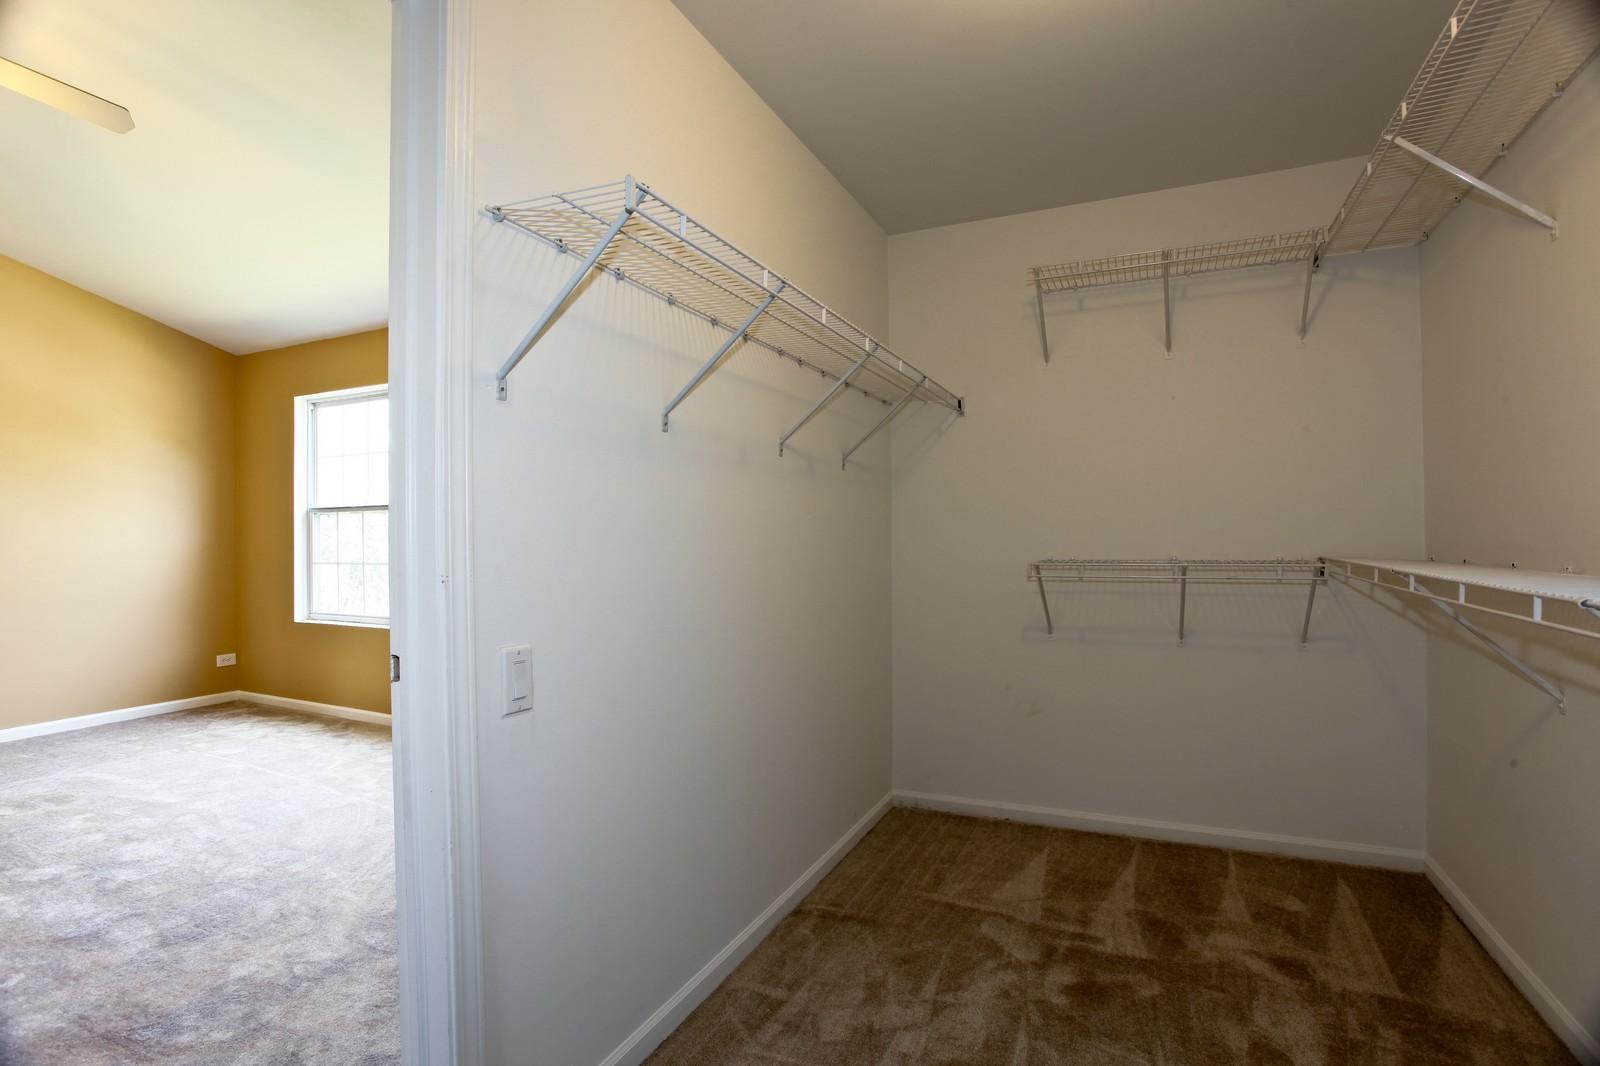 Real Estate Photography - 114 Oakton Dr, Lombard, IL, 60148 - Master Bedroom Closet